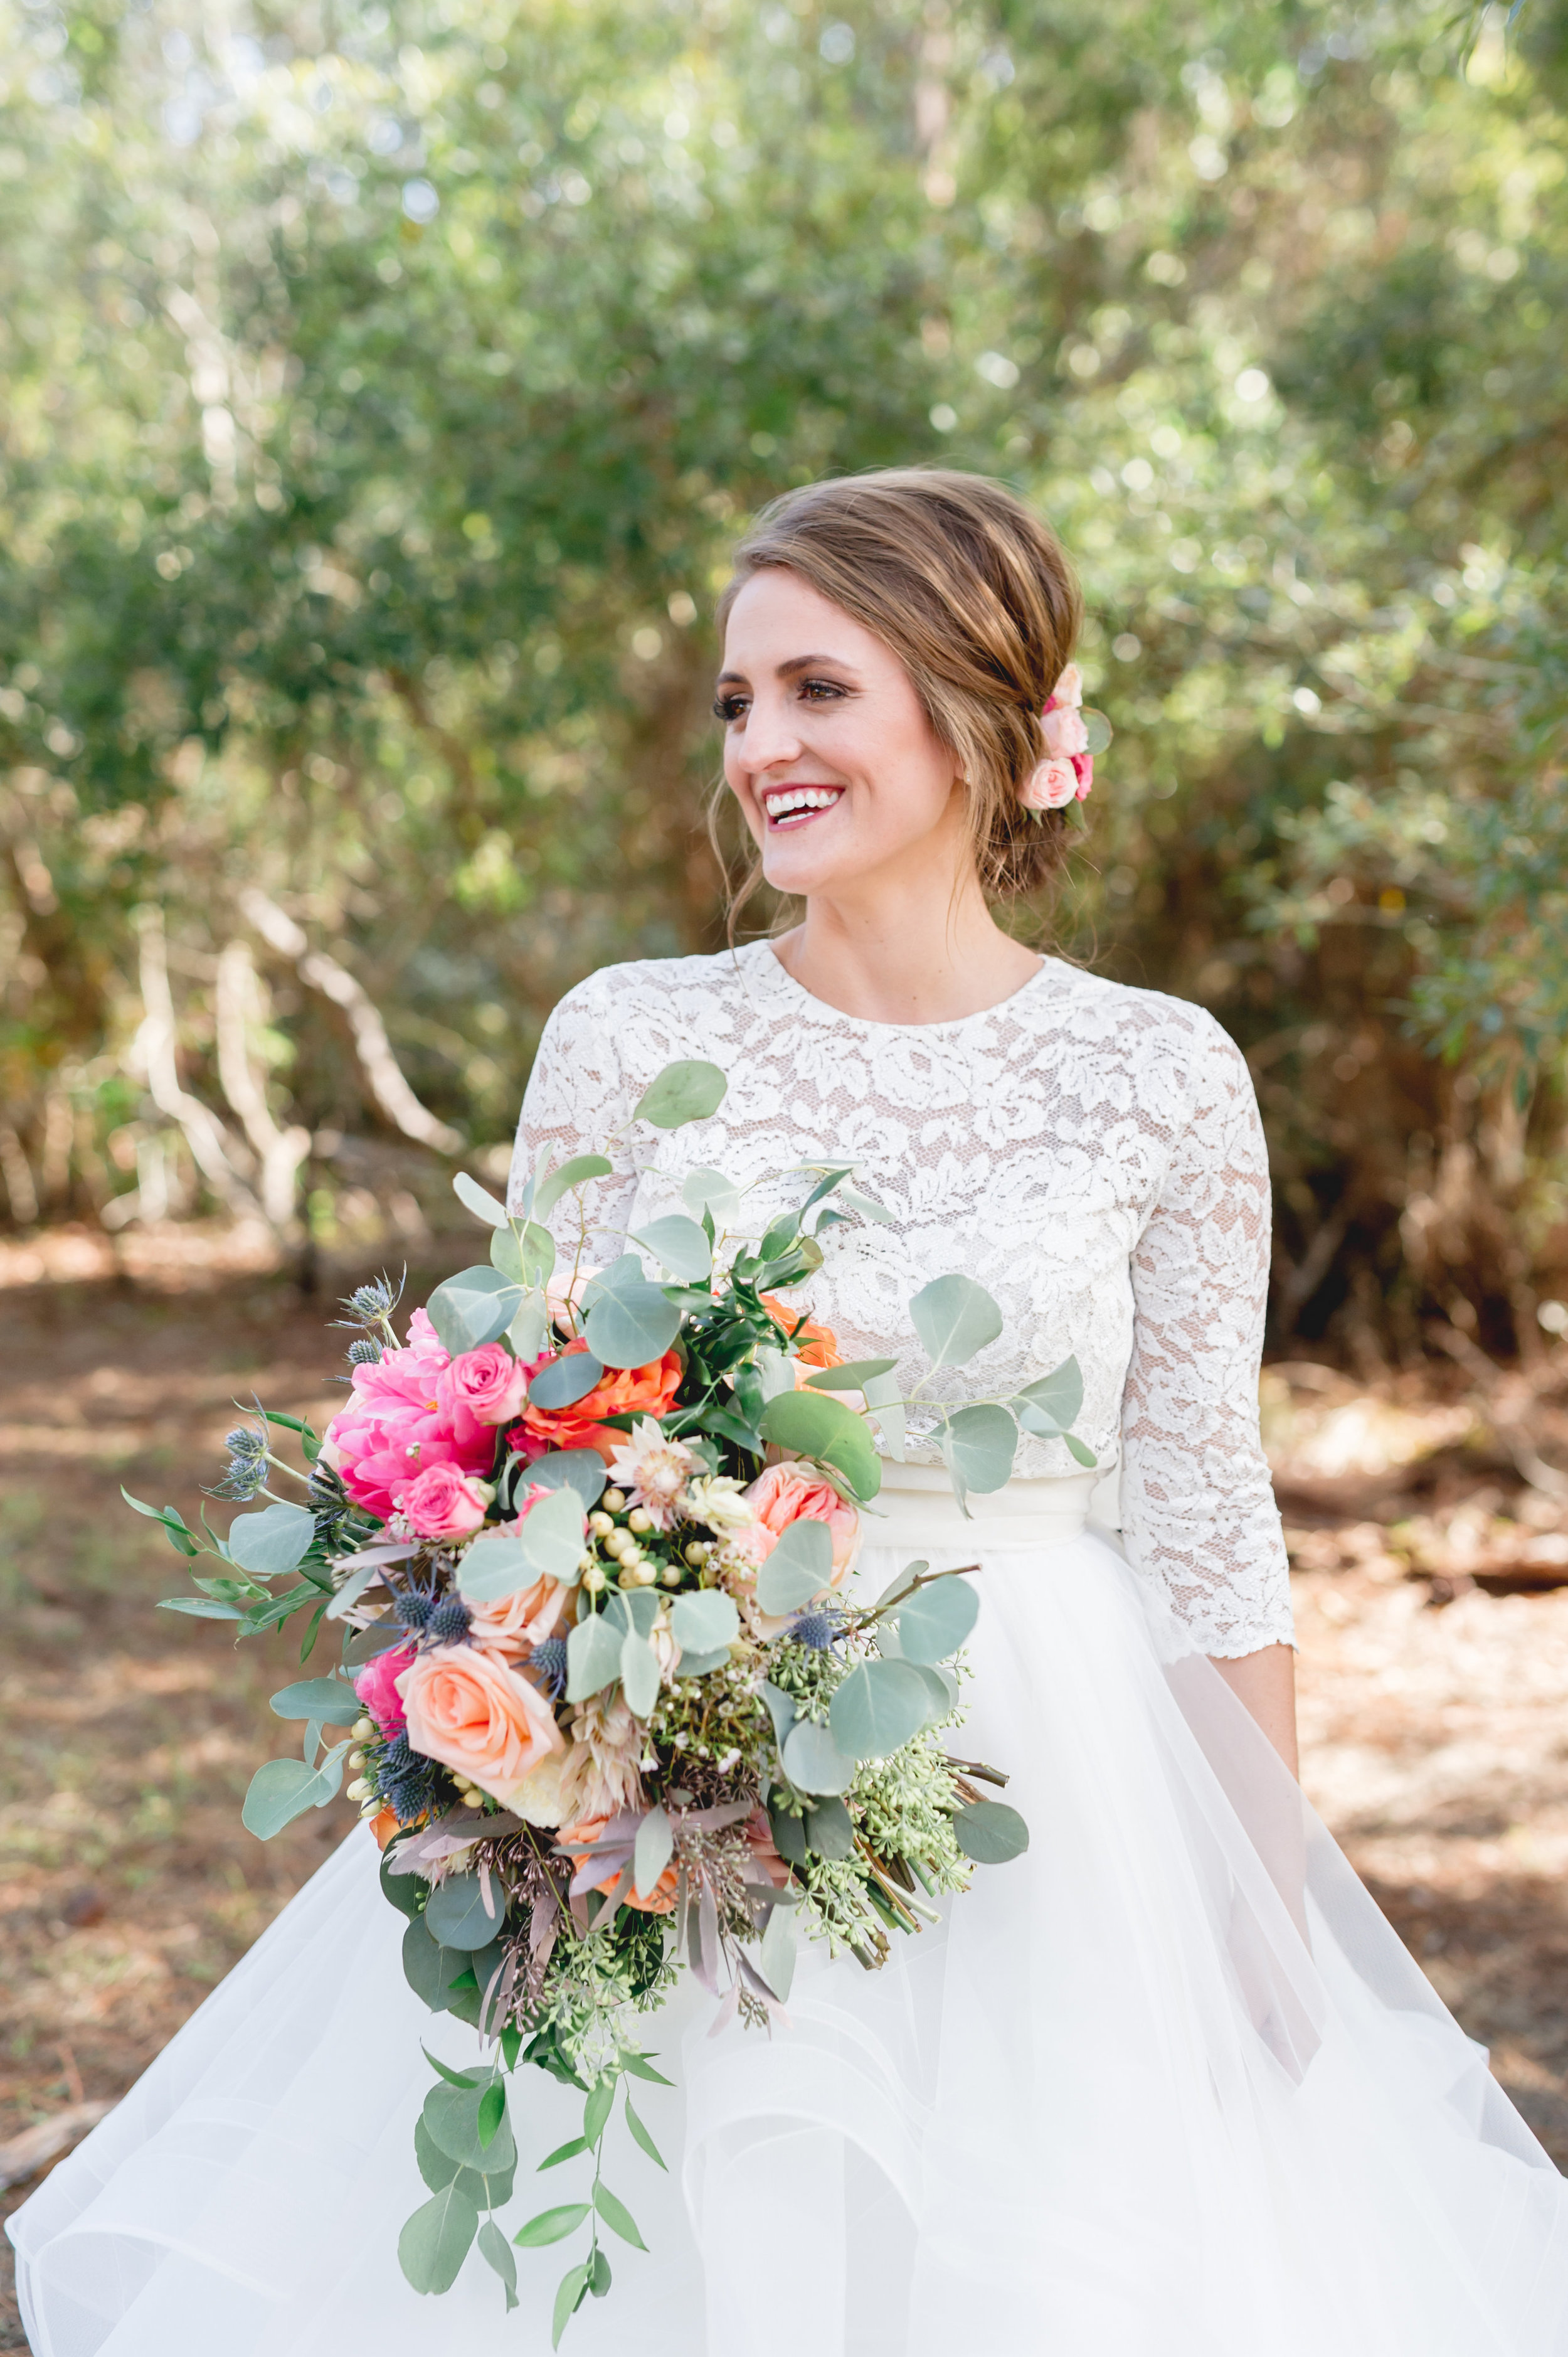 Joe Kendall Romantic Boho Wedding Gulf Shores AL-Bride and Groom-0012.jpg